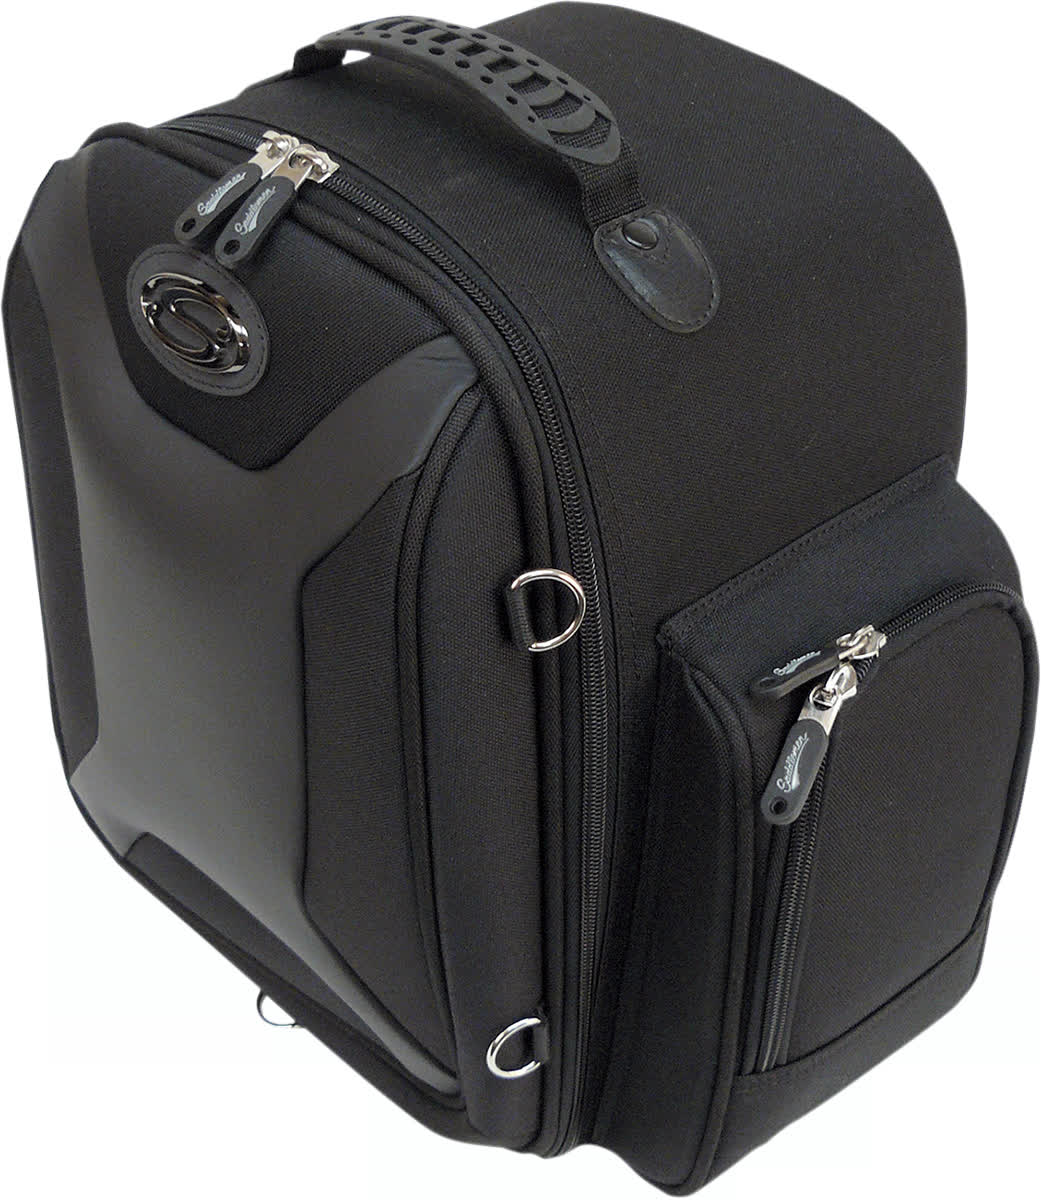 Saddlemen 3515-0139 FTB1500 Sport Sissy Bar Bag